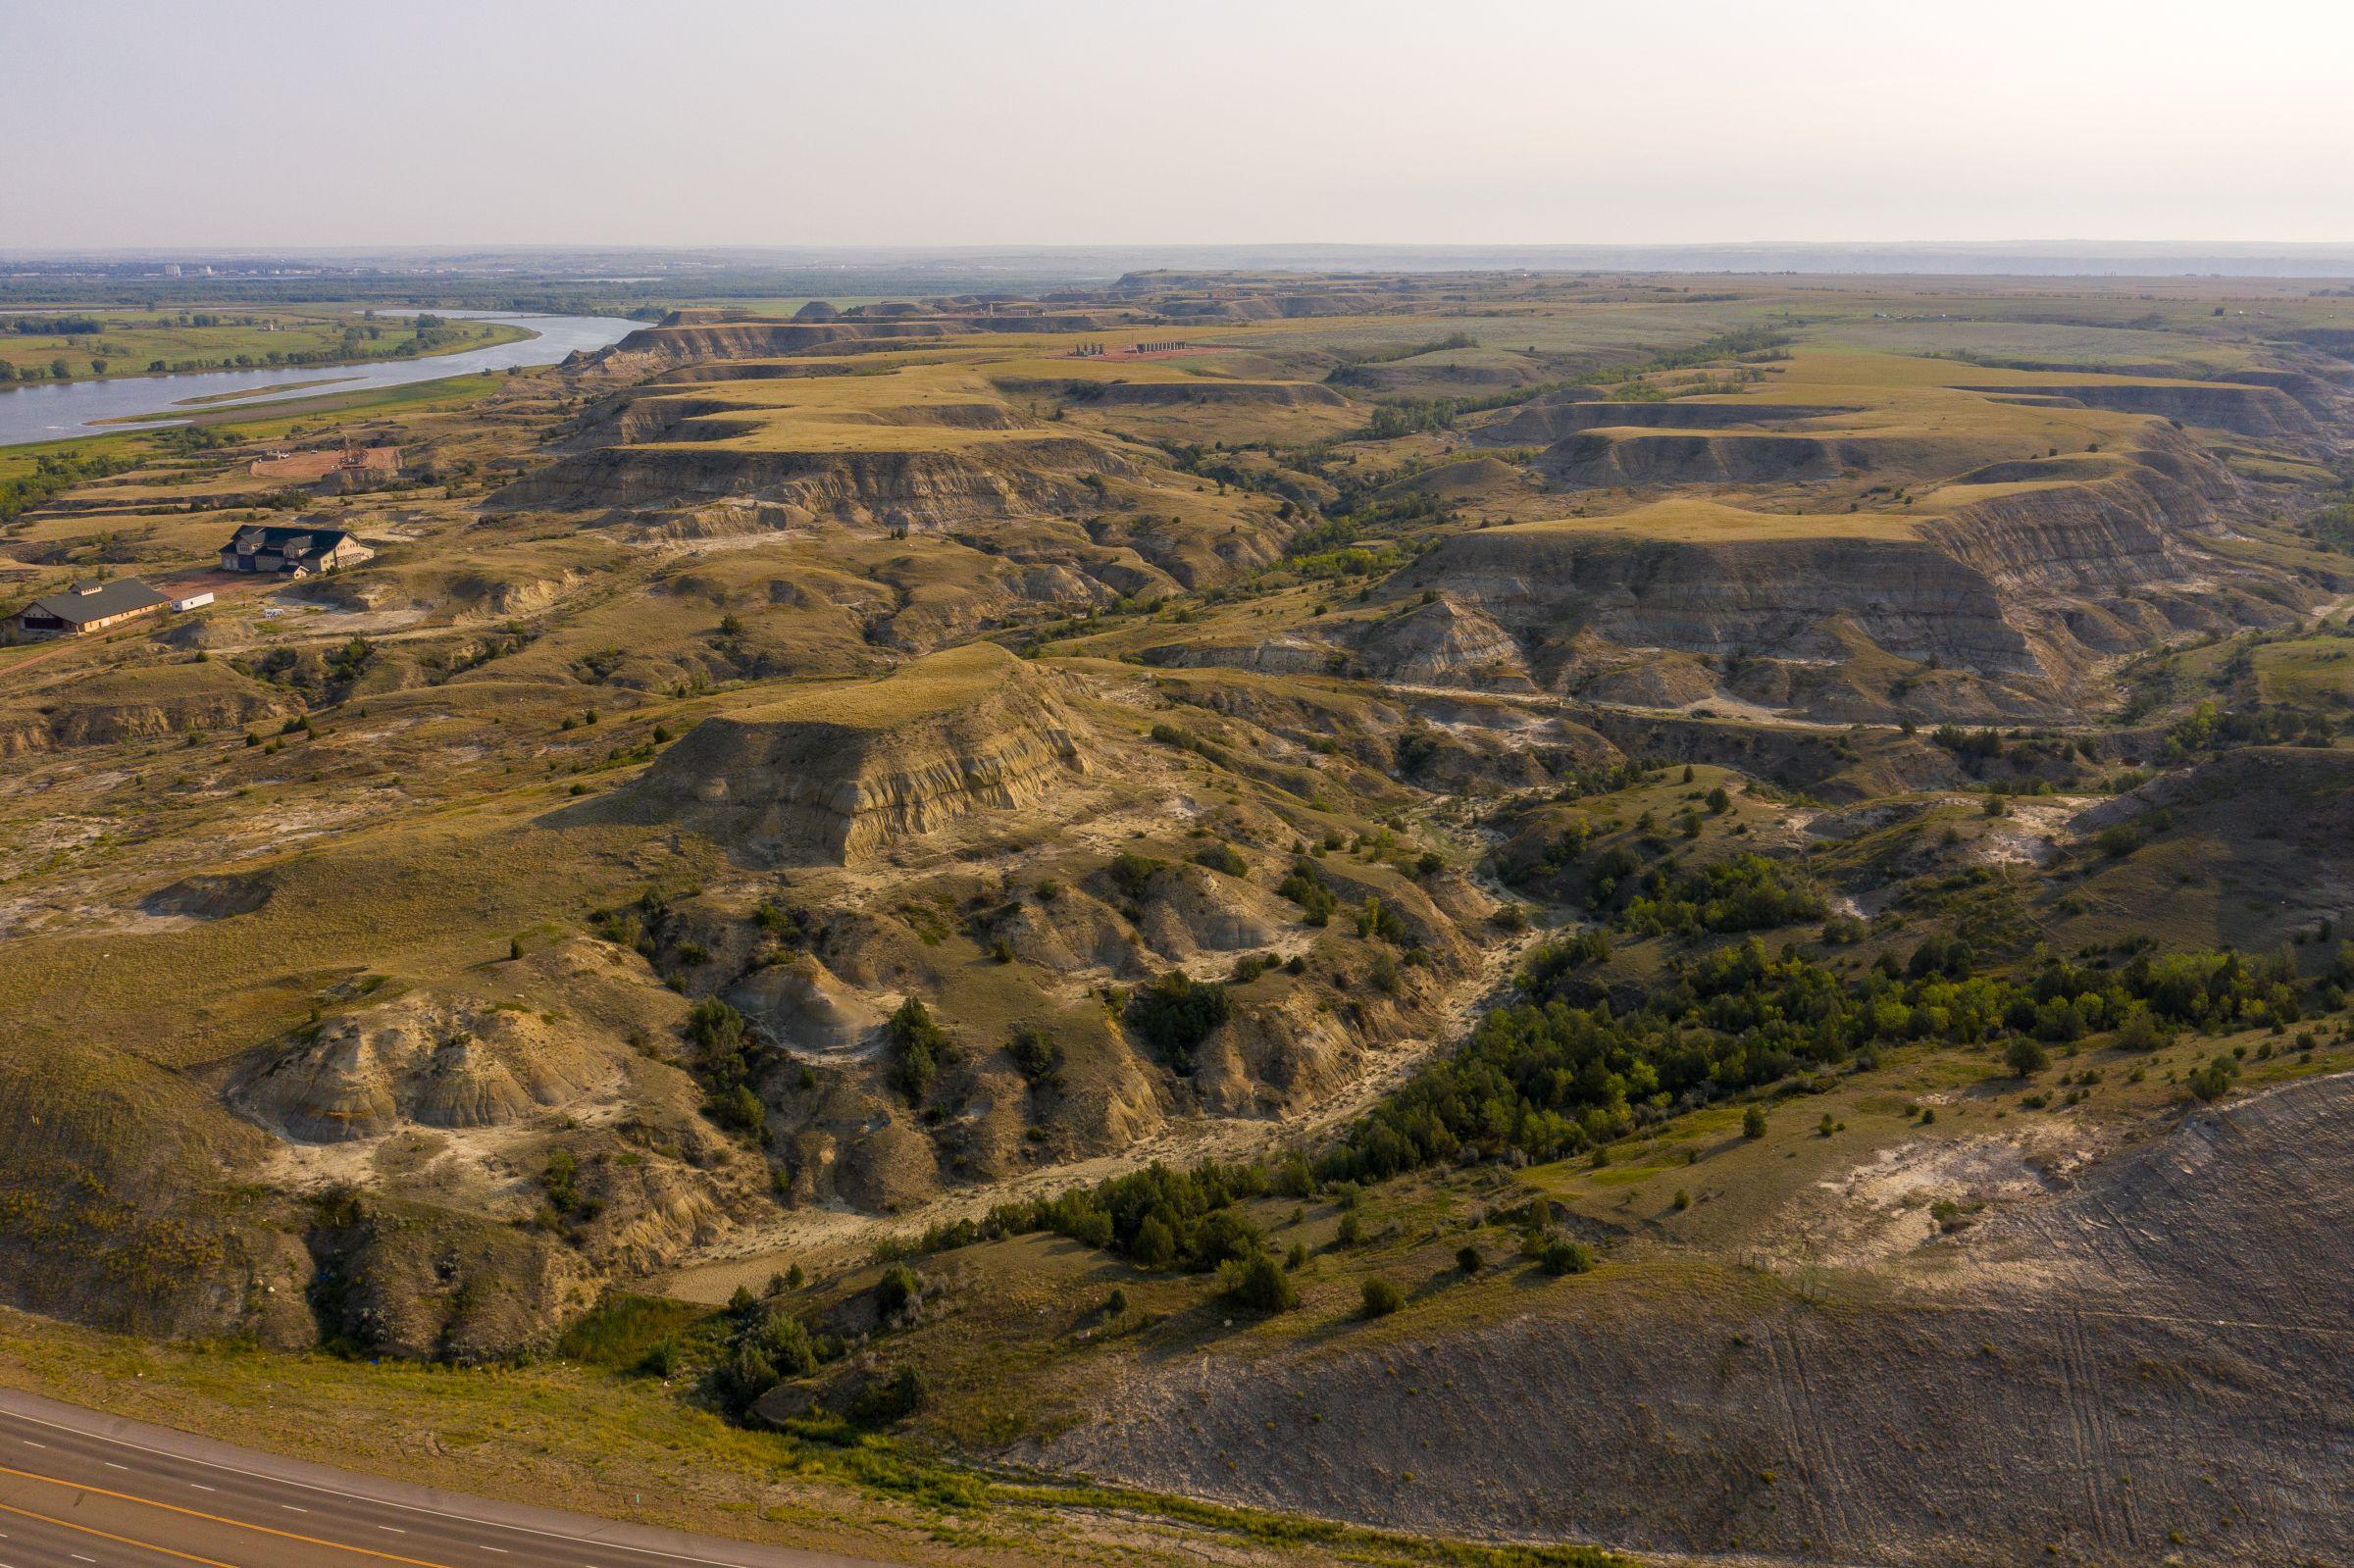 auctions-land-mckenzie-county-north-dakota-270-acres-listing-number-15735-2-2021-09-09-214126.jpeg